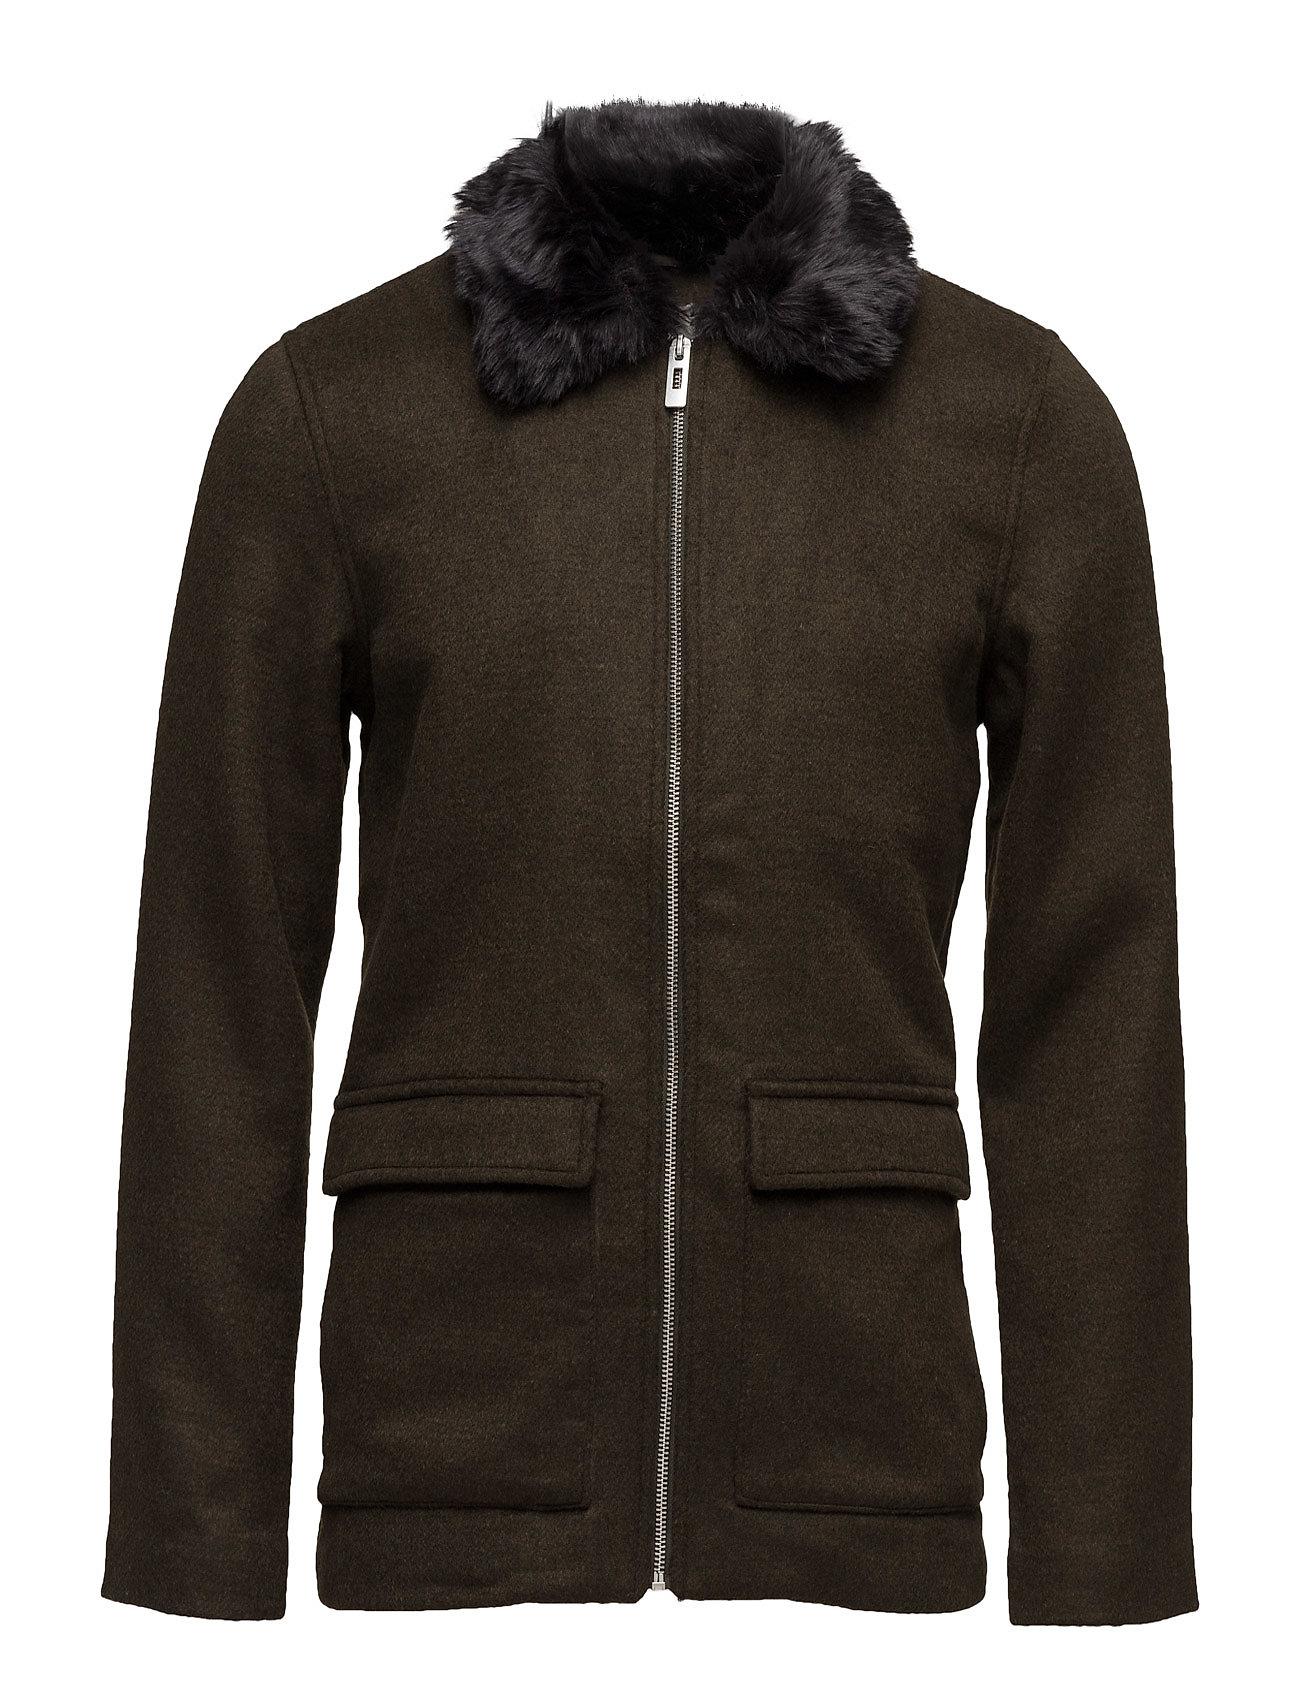 han kjã¸benhavn Wool air jacket på boozt.com dk